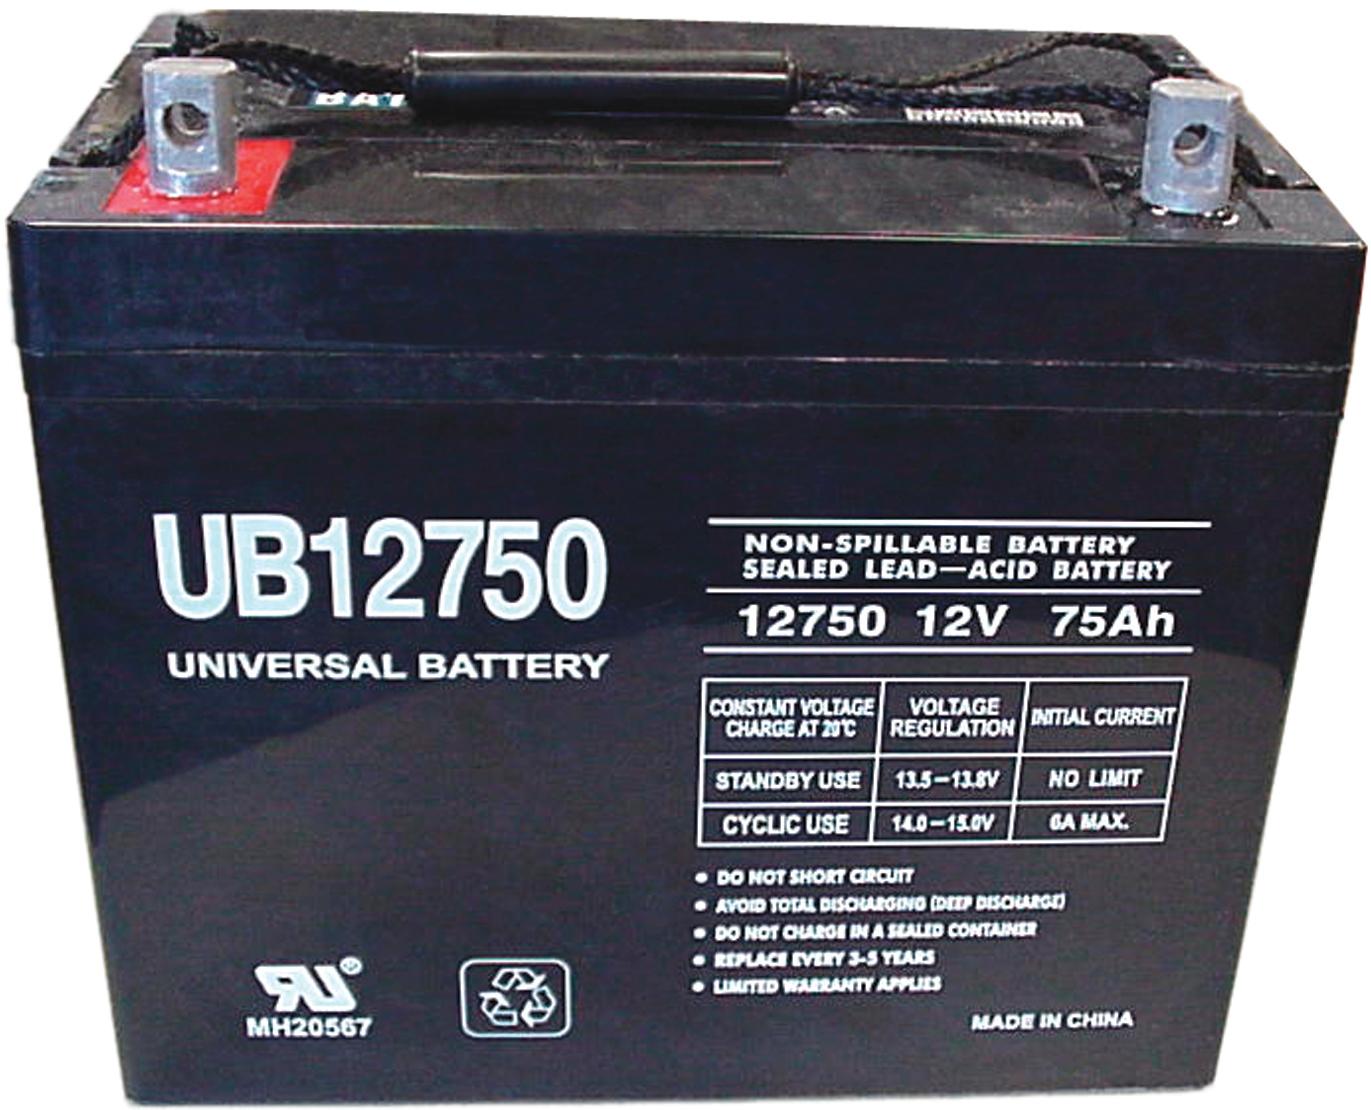 Ts Distributors Lead Acid Battery